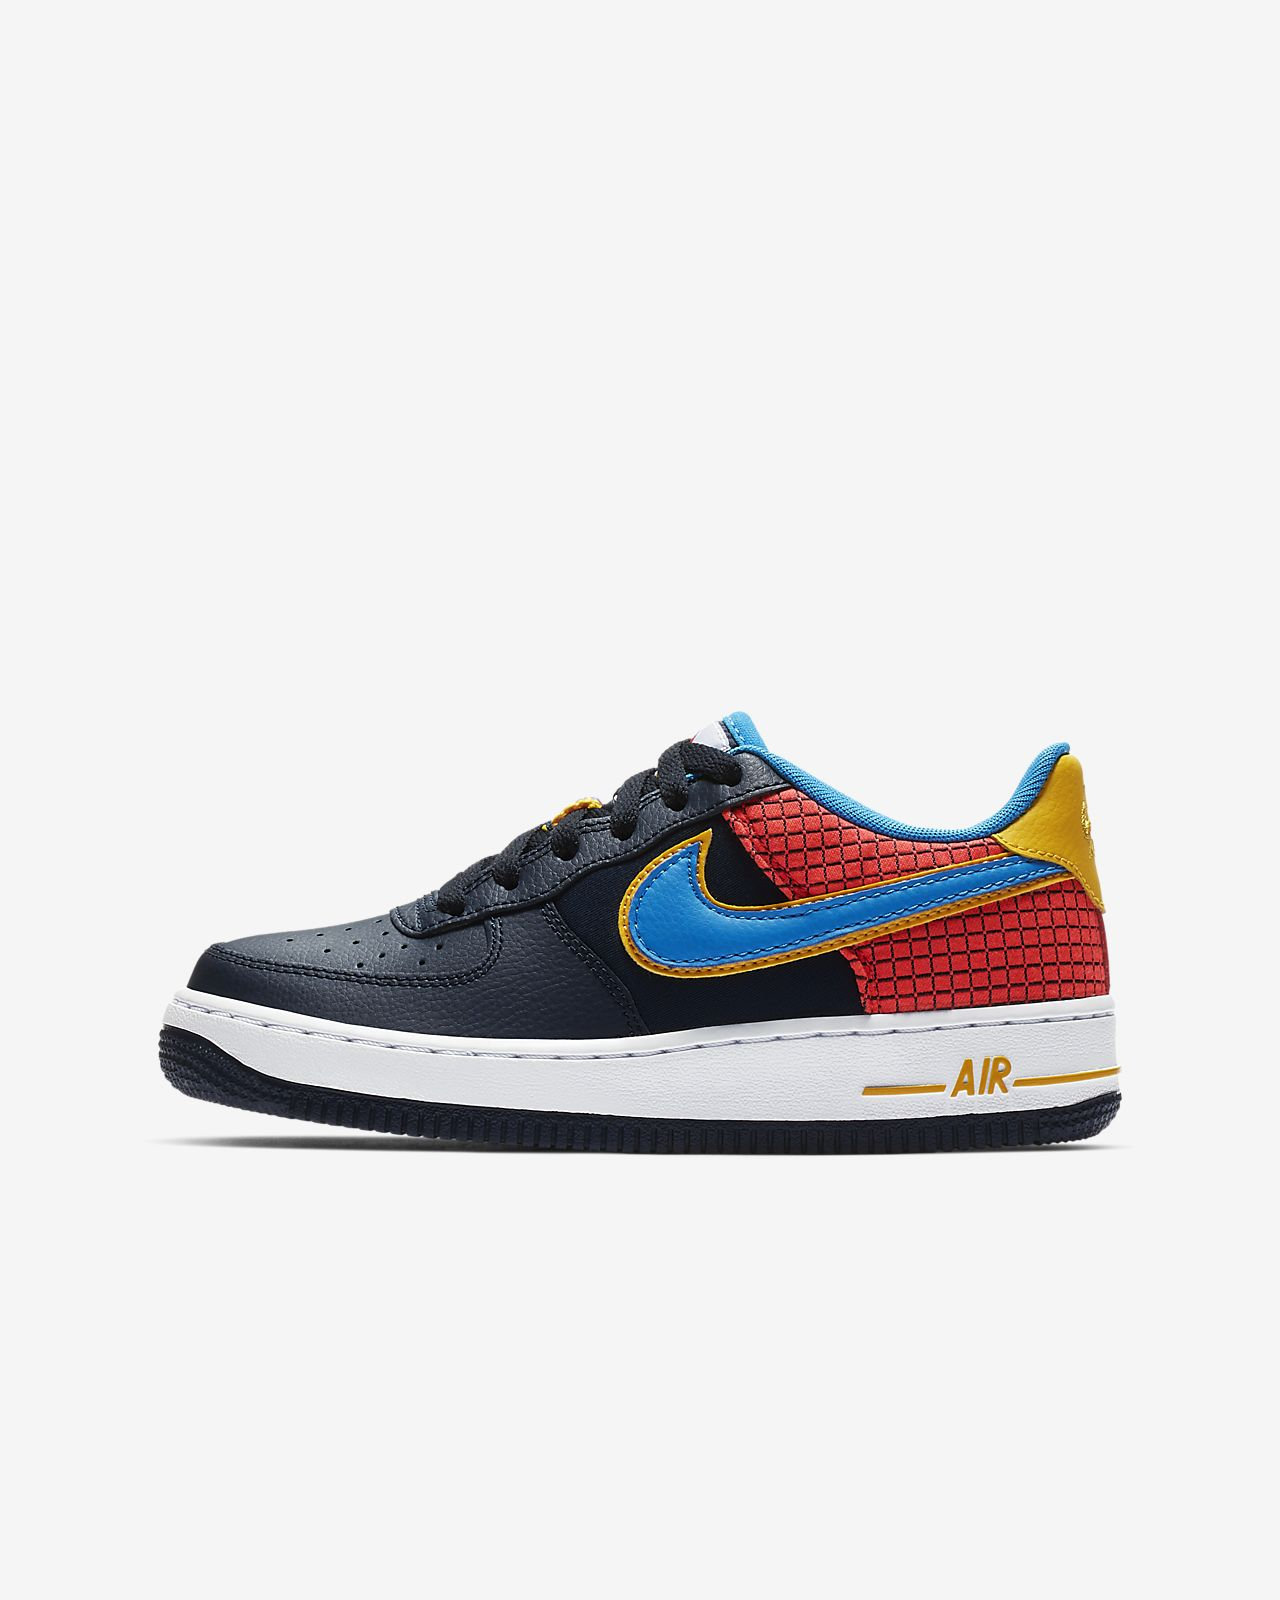 best sneakers f7a37 37e9e ... Nike Air Force 1 Now Big Kids  Shoe